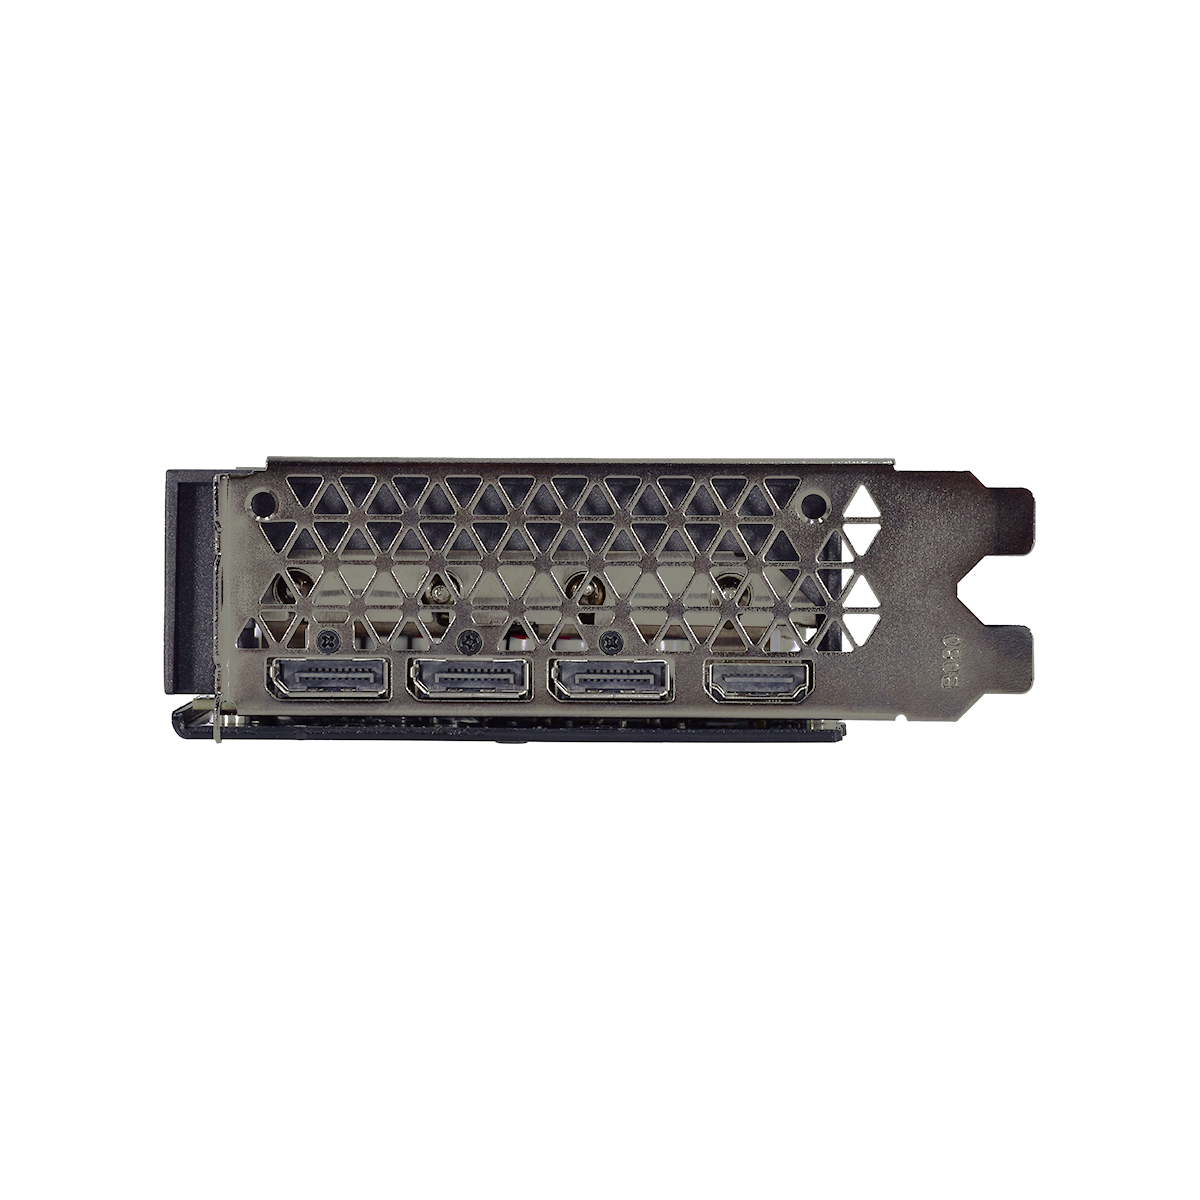 ELSA RTX 3060 SAC/L graphics card